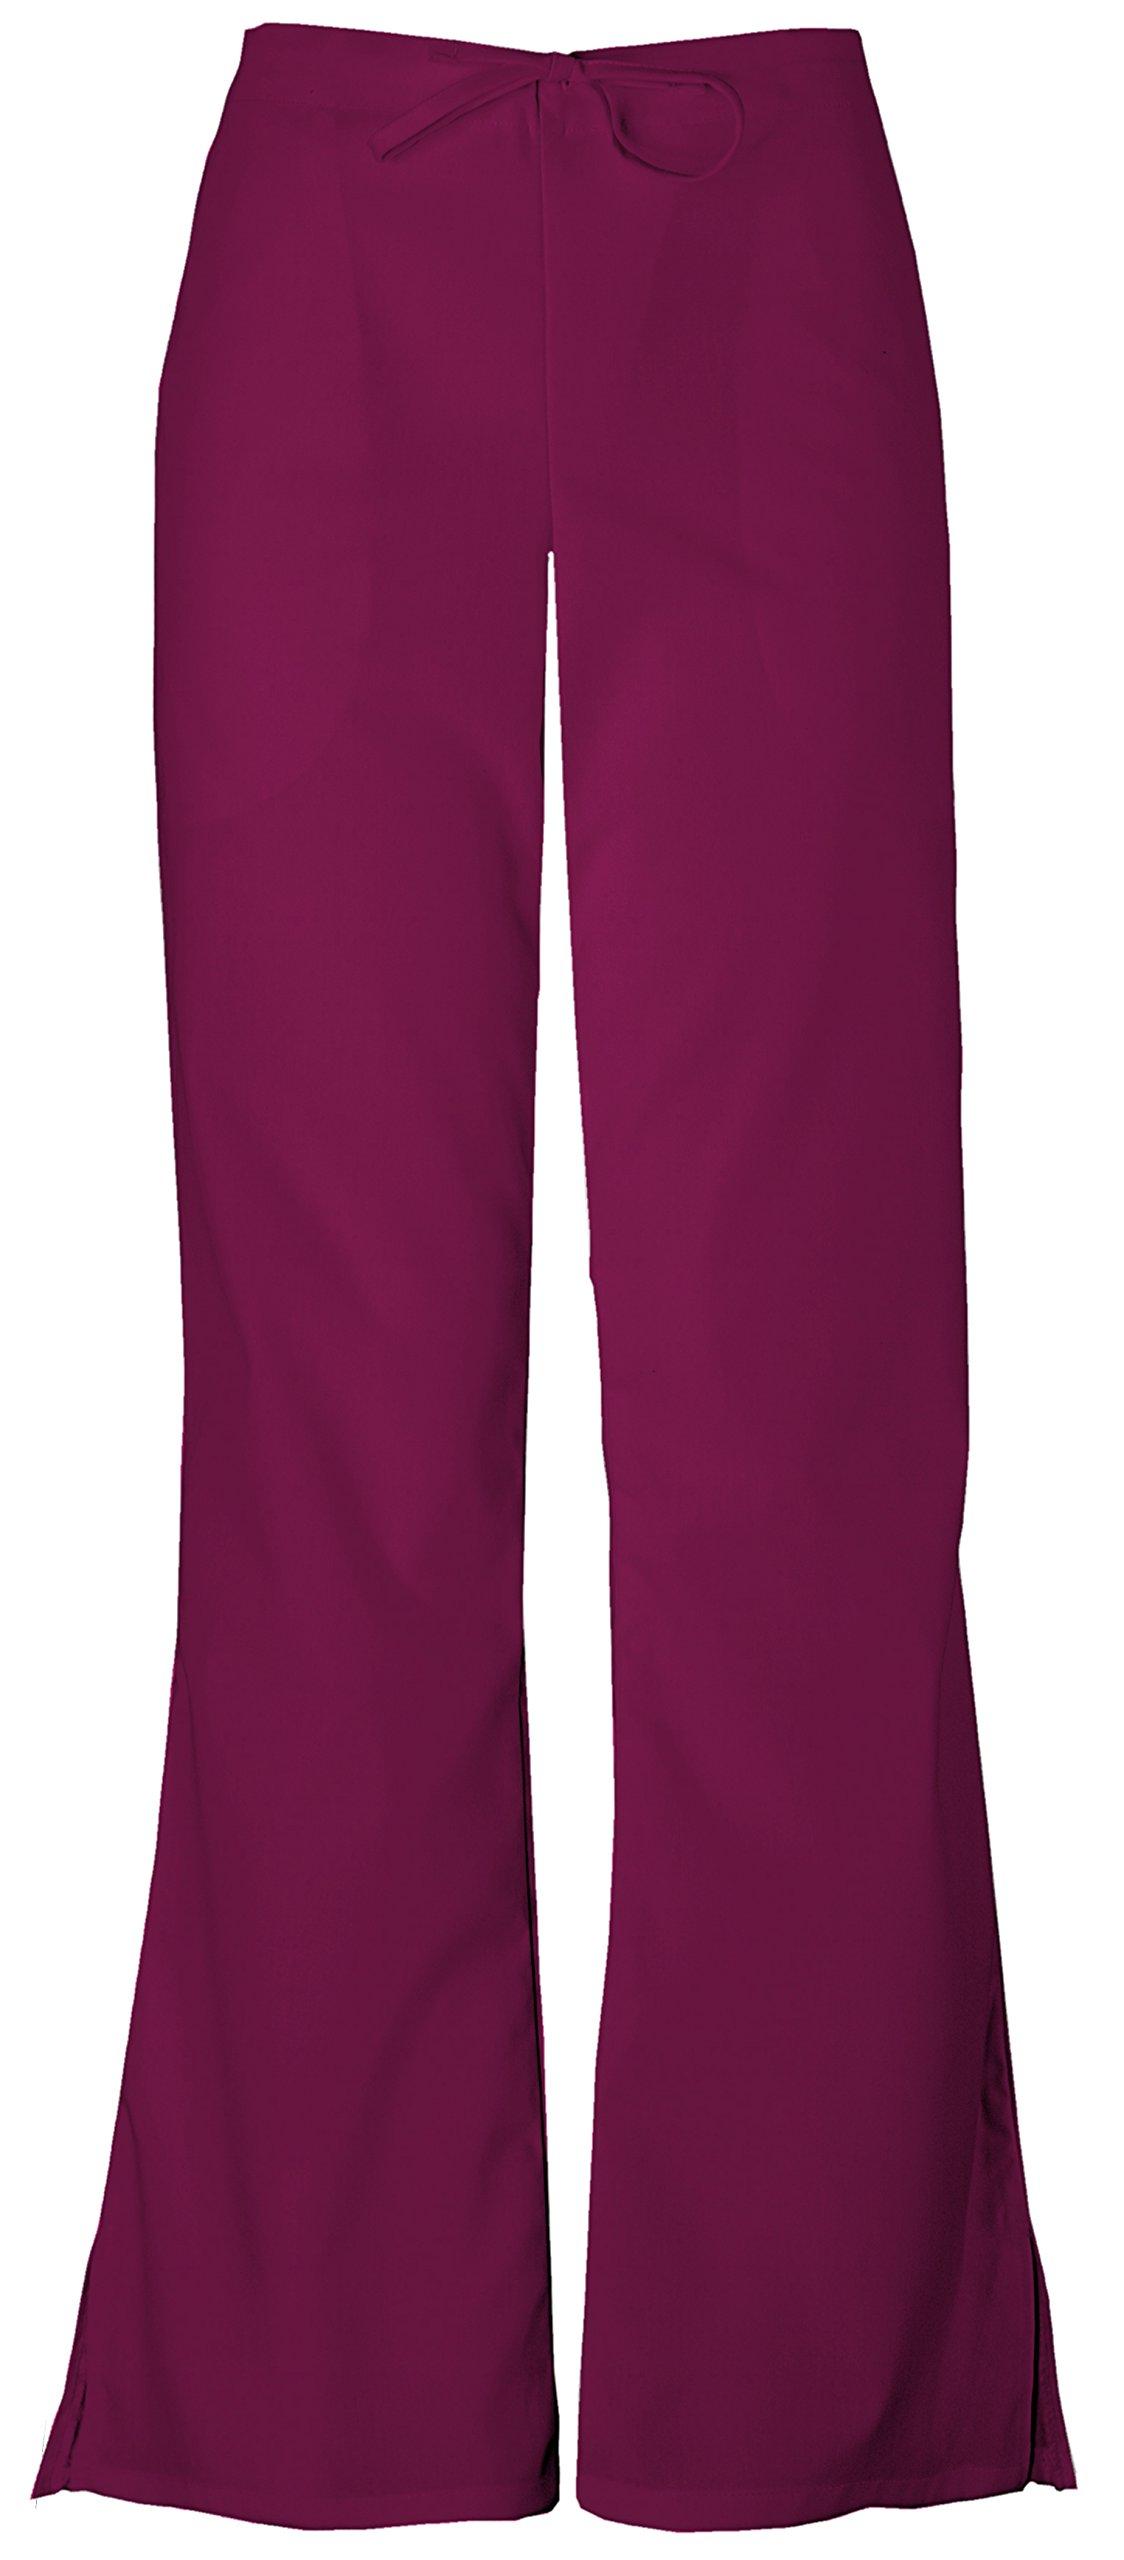 Cherokee Workwear Originals Women's Natural Rise Flare Leg Scrub Pants XX-Small Wine